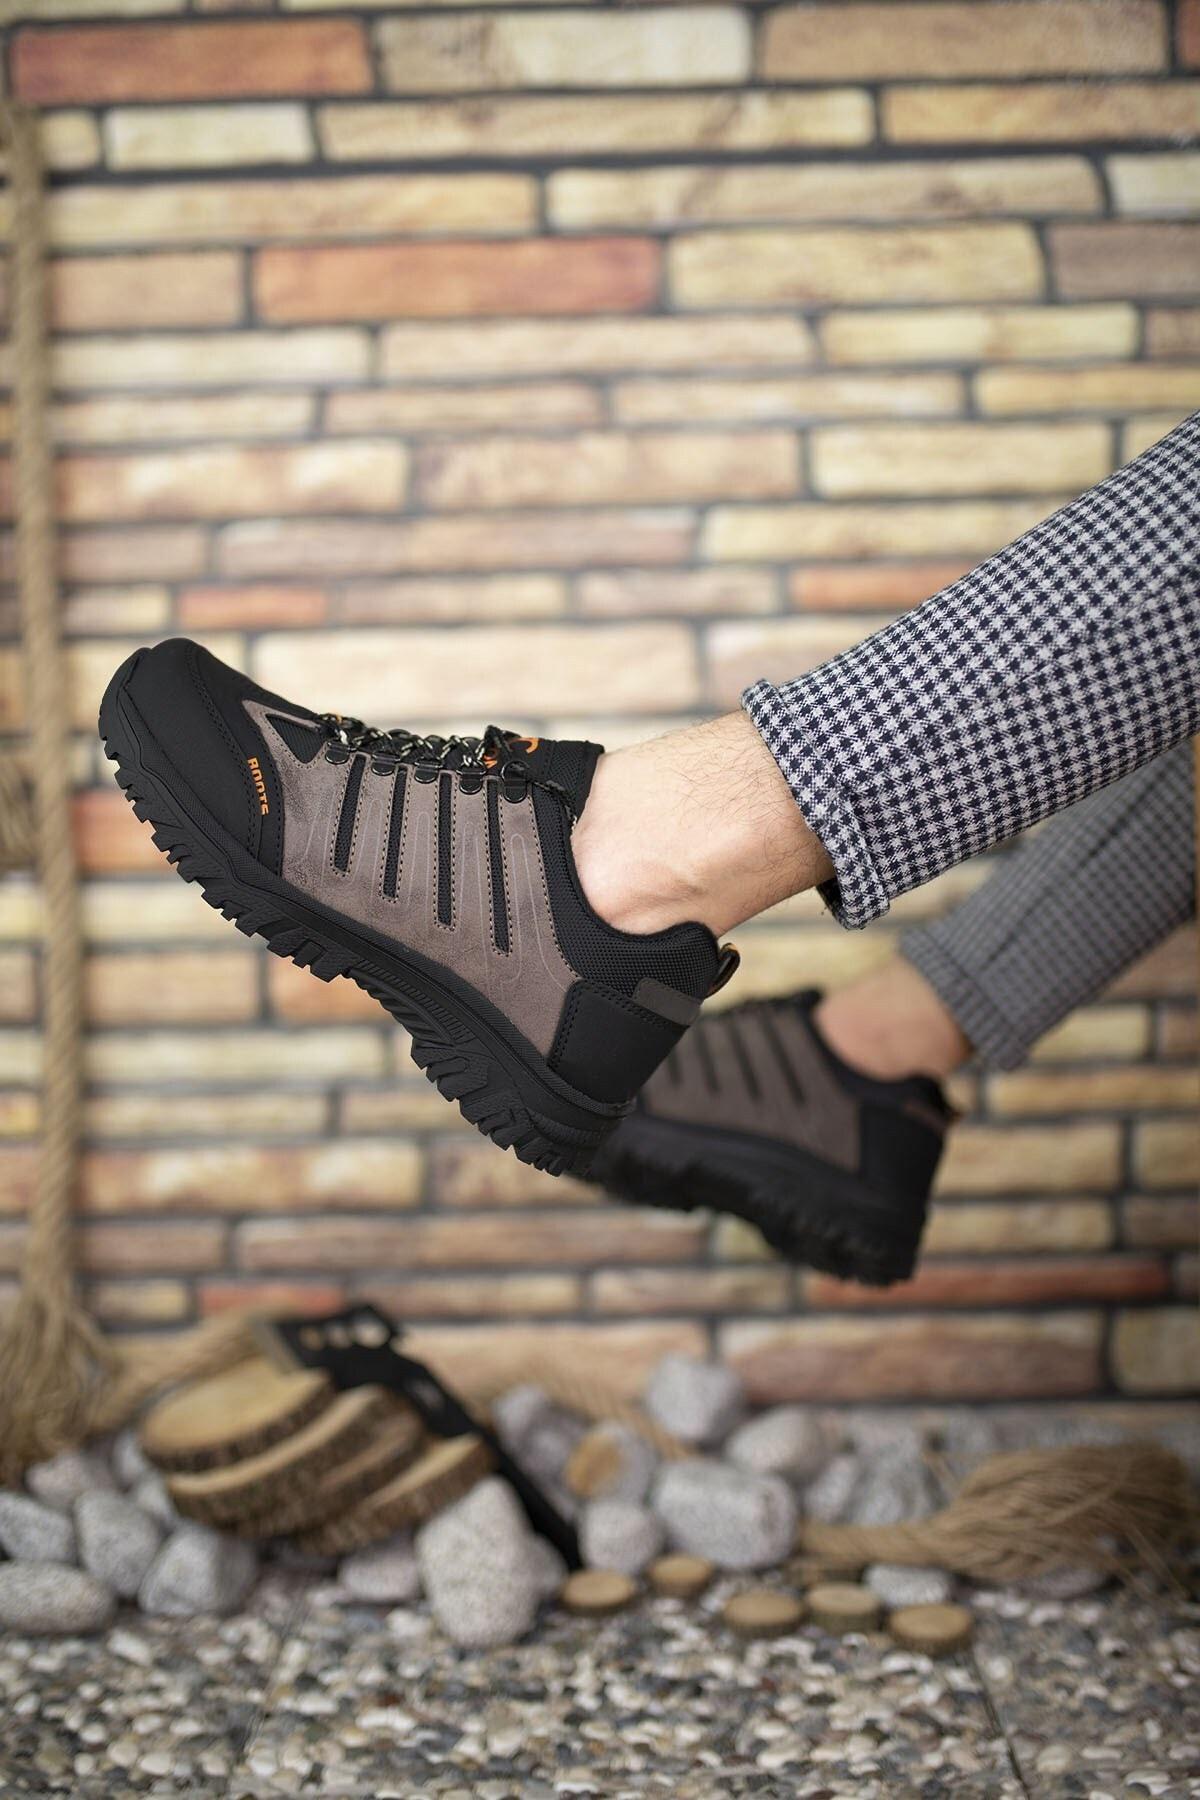 Riccon Kahverengi Siyah Erkek Trekking Ayakkabı 0012115 2